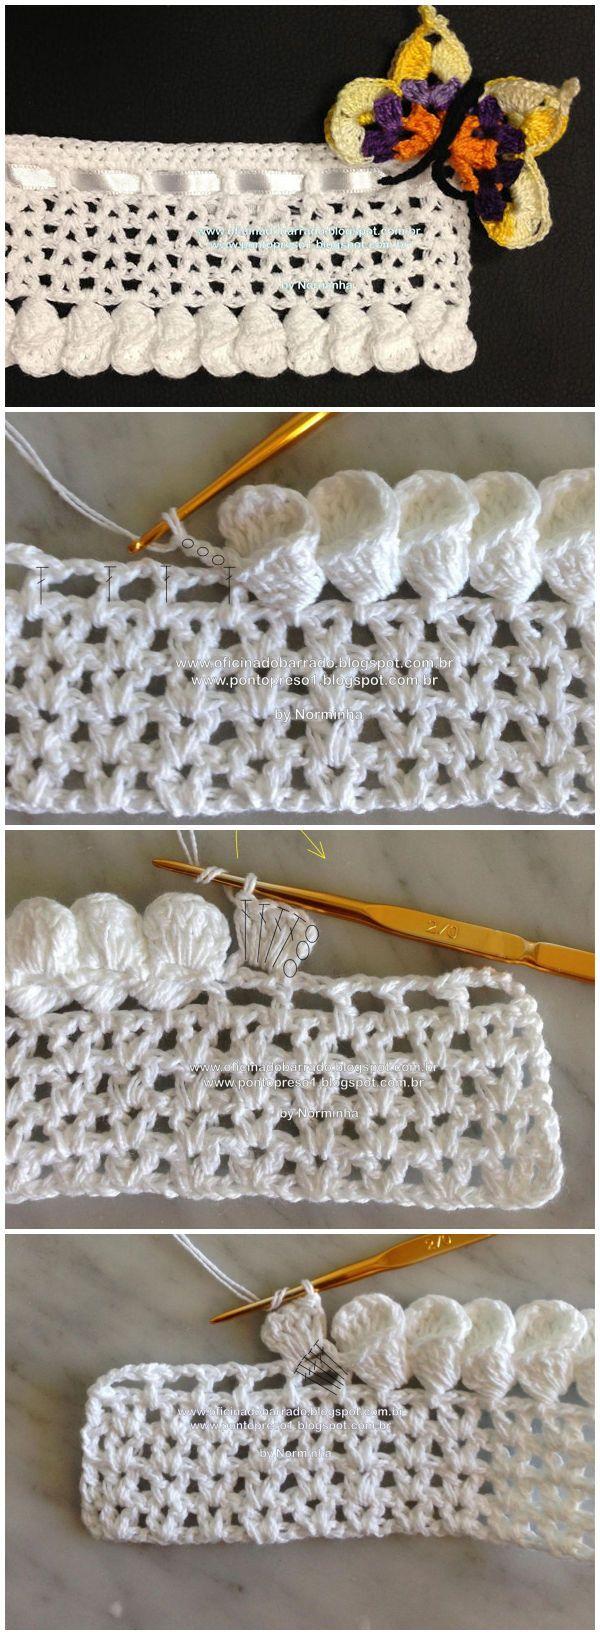 Crochet Petal Cone Edging